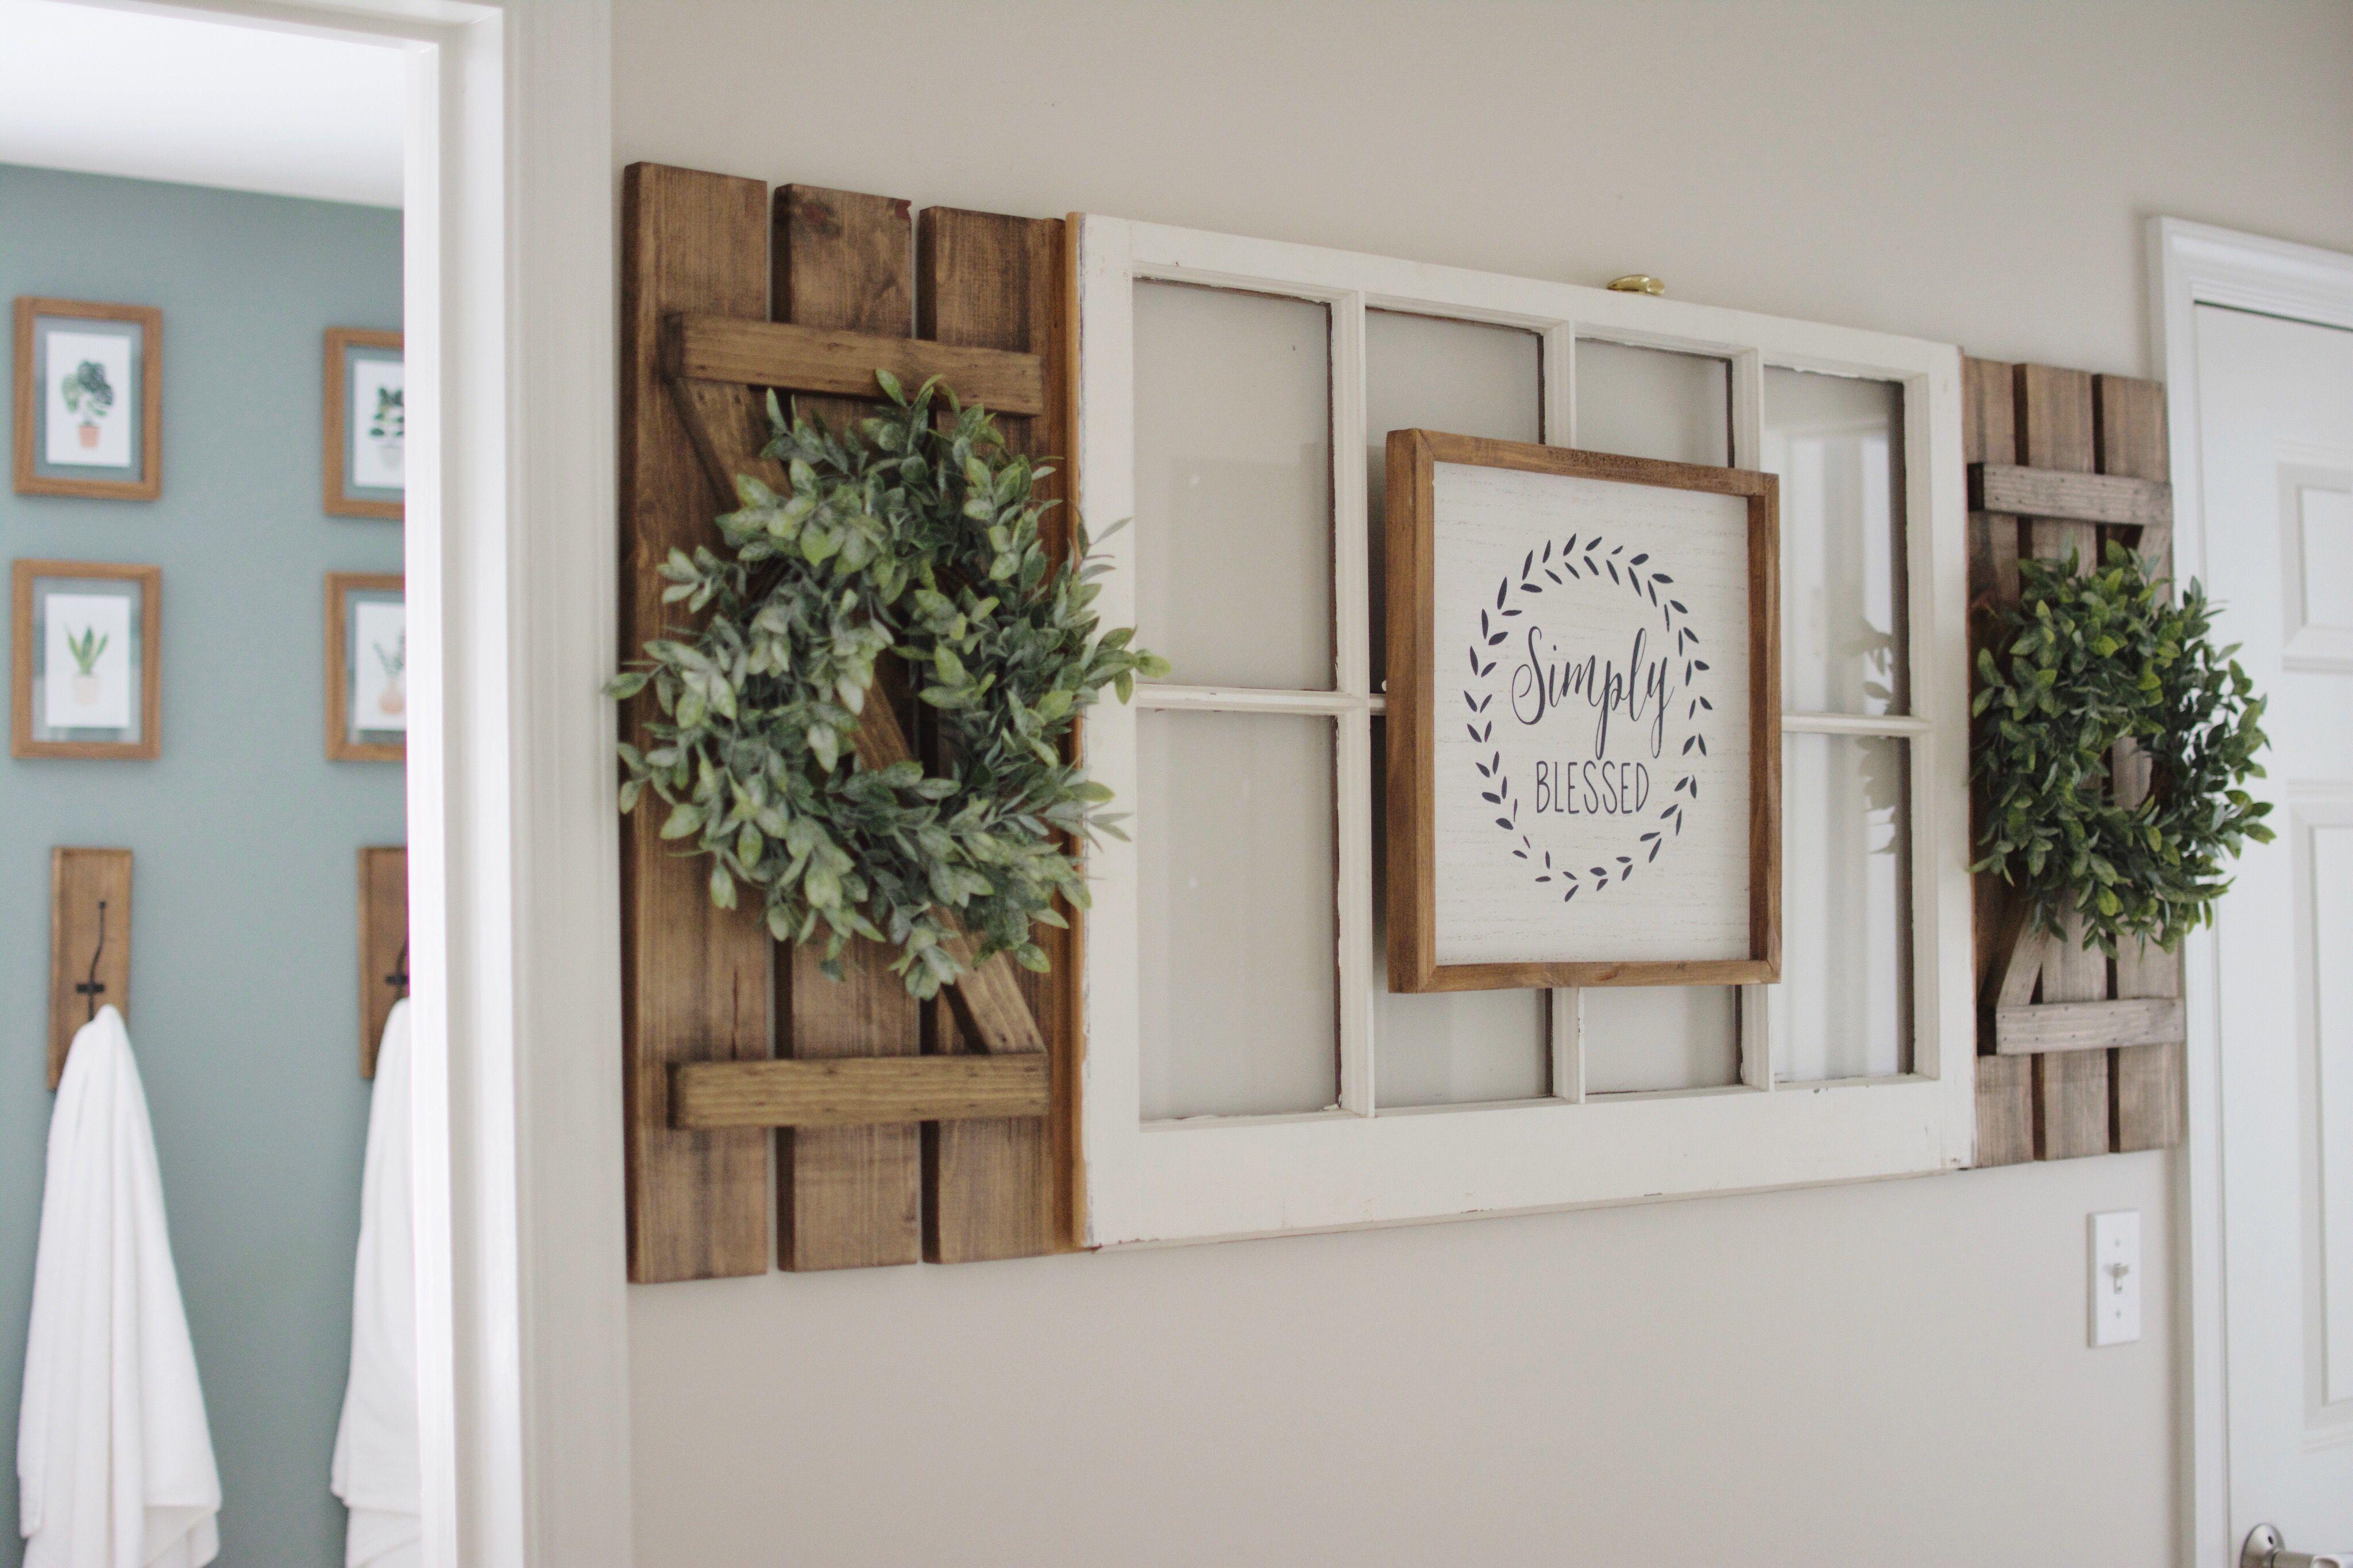 Antique Window Diy Shutters Wreaths Hallway Shutter Wall Decor Window Wall Decor Farmhouse Decor